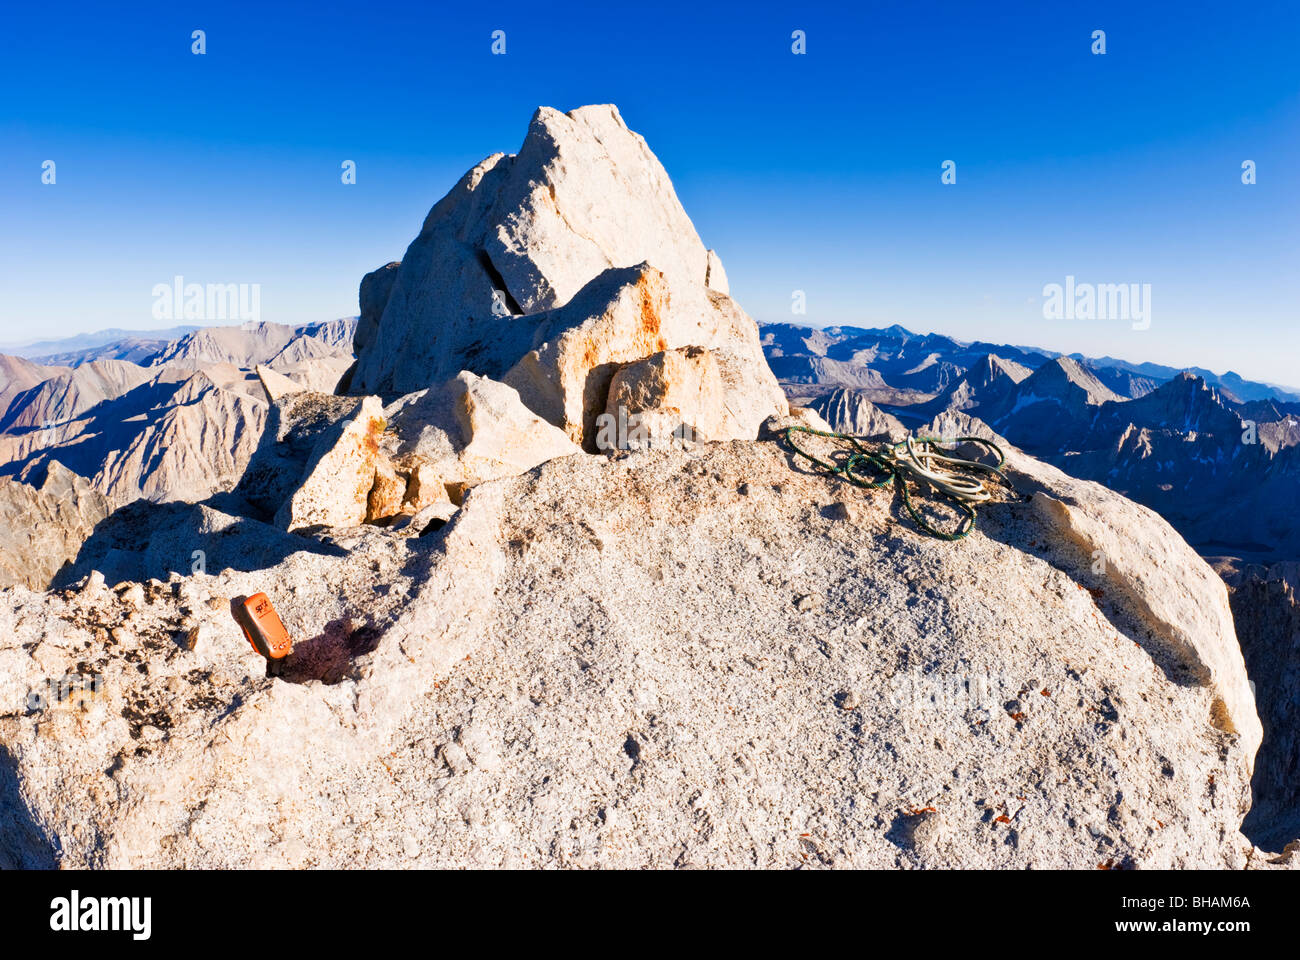 Manchas de Messenger en la cumbre de Bear Creek Spire, John Muir desierto, montañas de Sierra Nevada, California Imagen De Stock